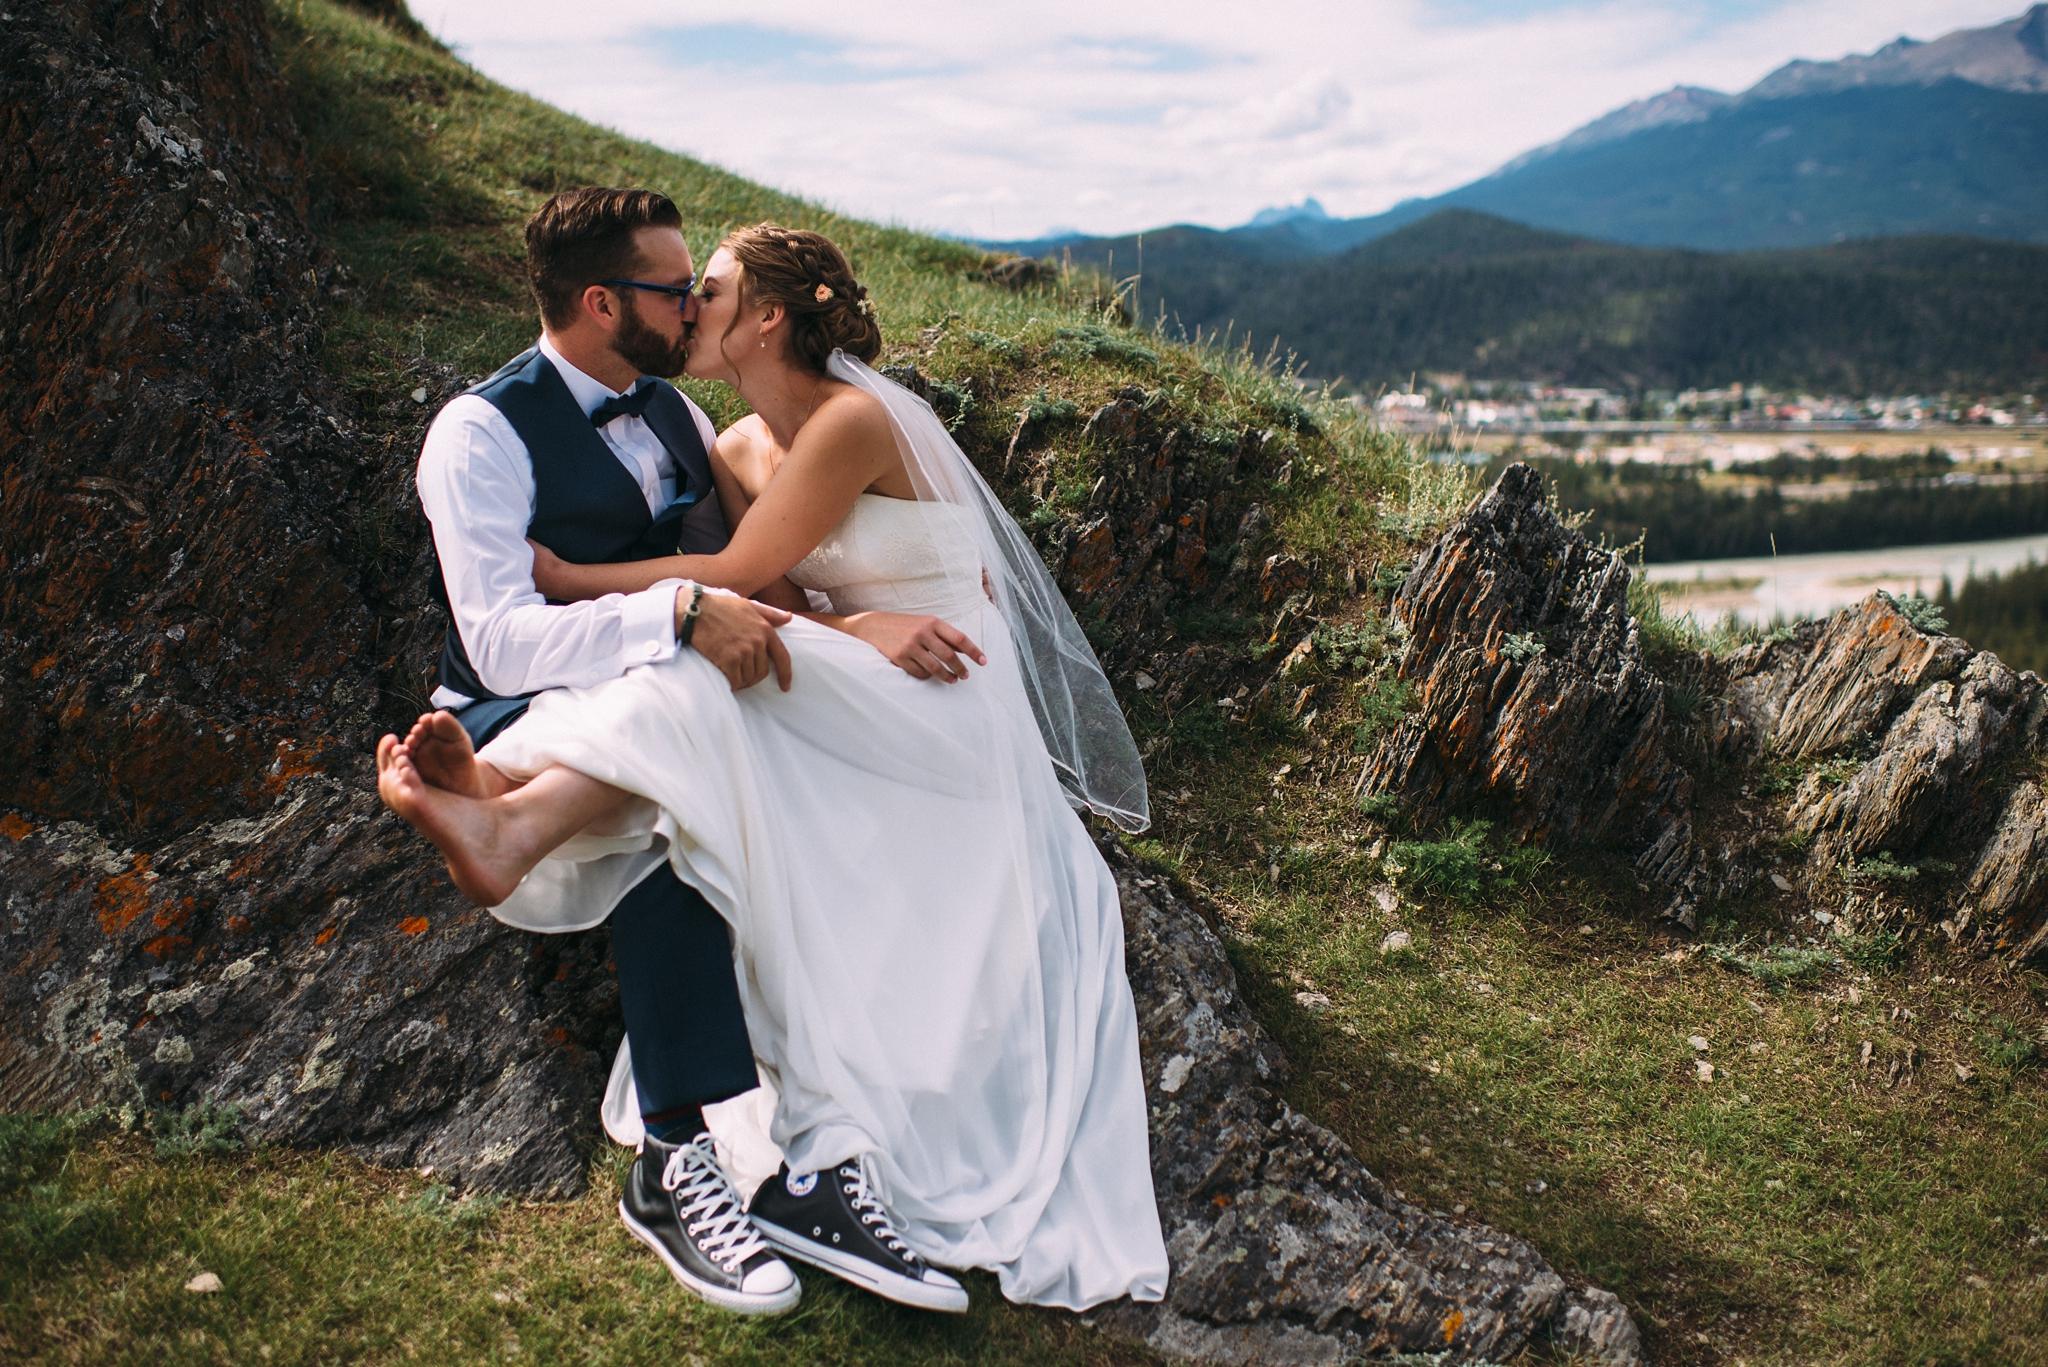 kaihla_tonai_intimate_wedding_elopement_photographer_2483